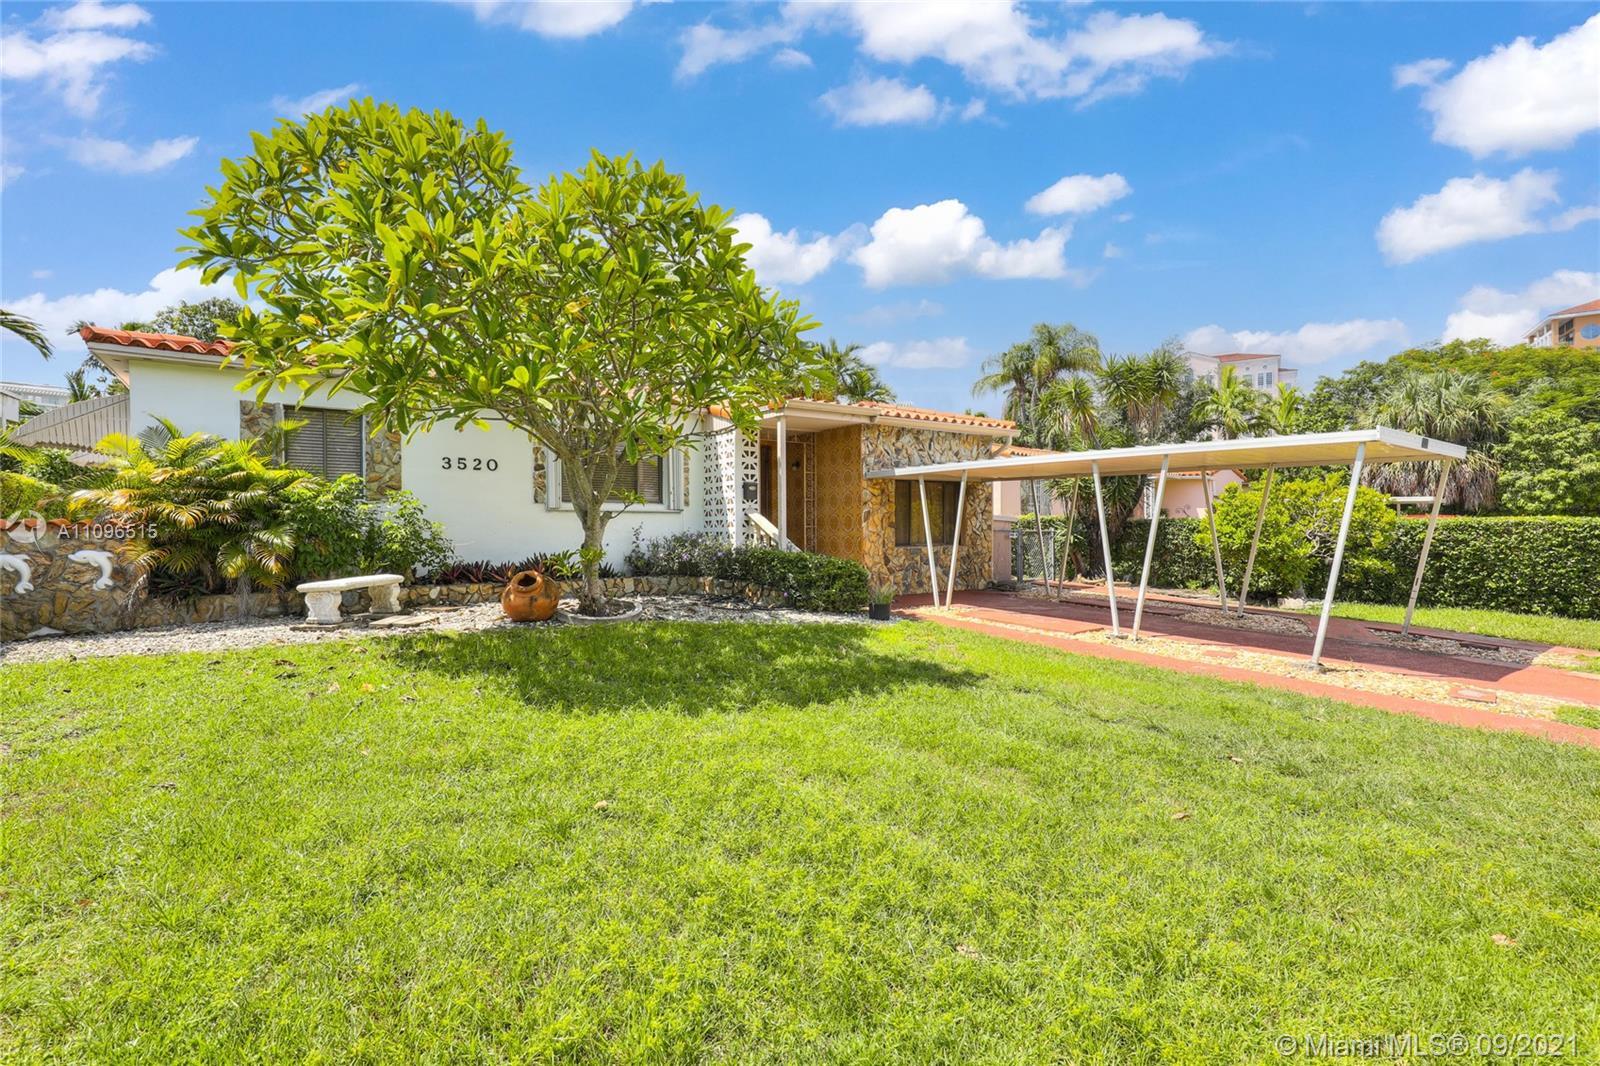 Single Family Home,For Sale,3520 SW 20th St, Miami, Florida 33145,Brickell,realty,broker,condos near me